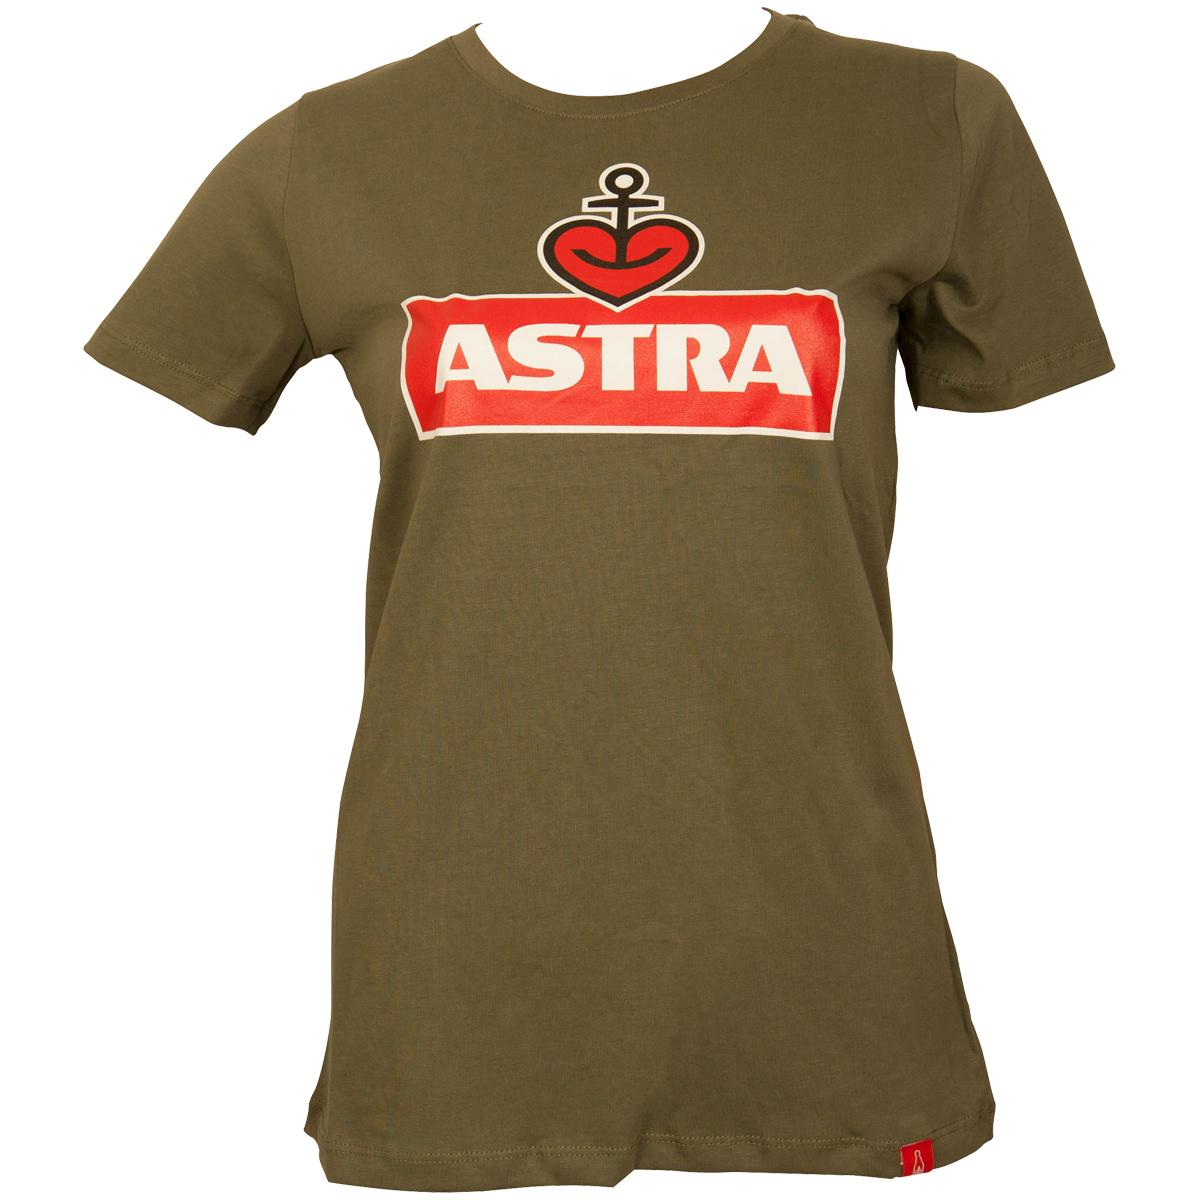 Astra - Damen T-Shirt Logo - oliv